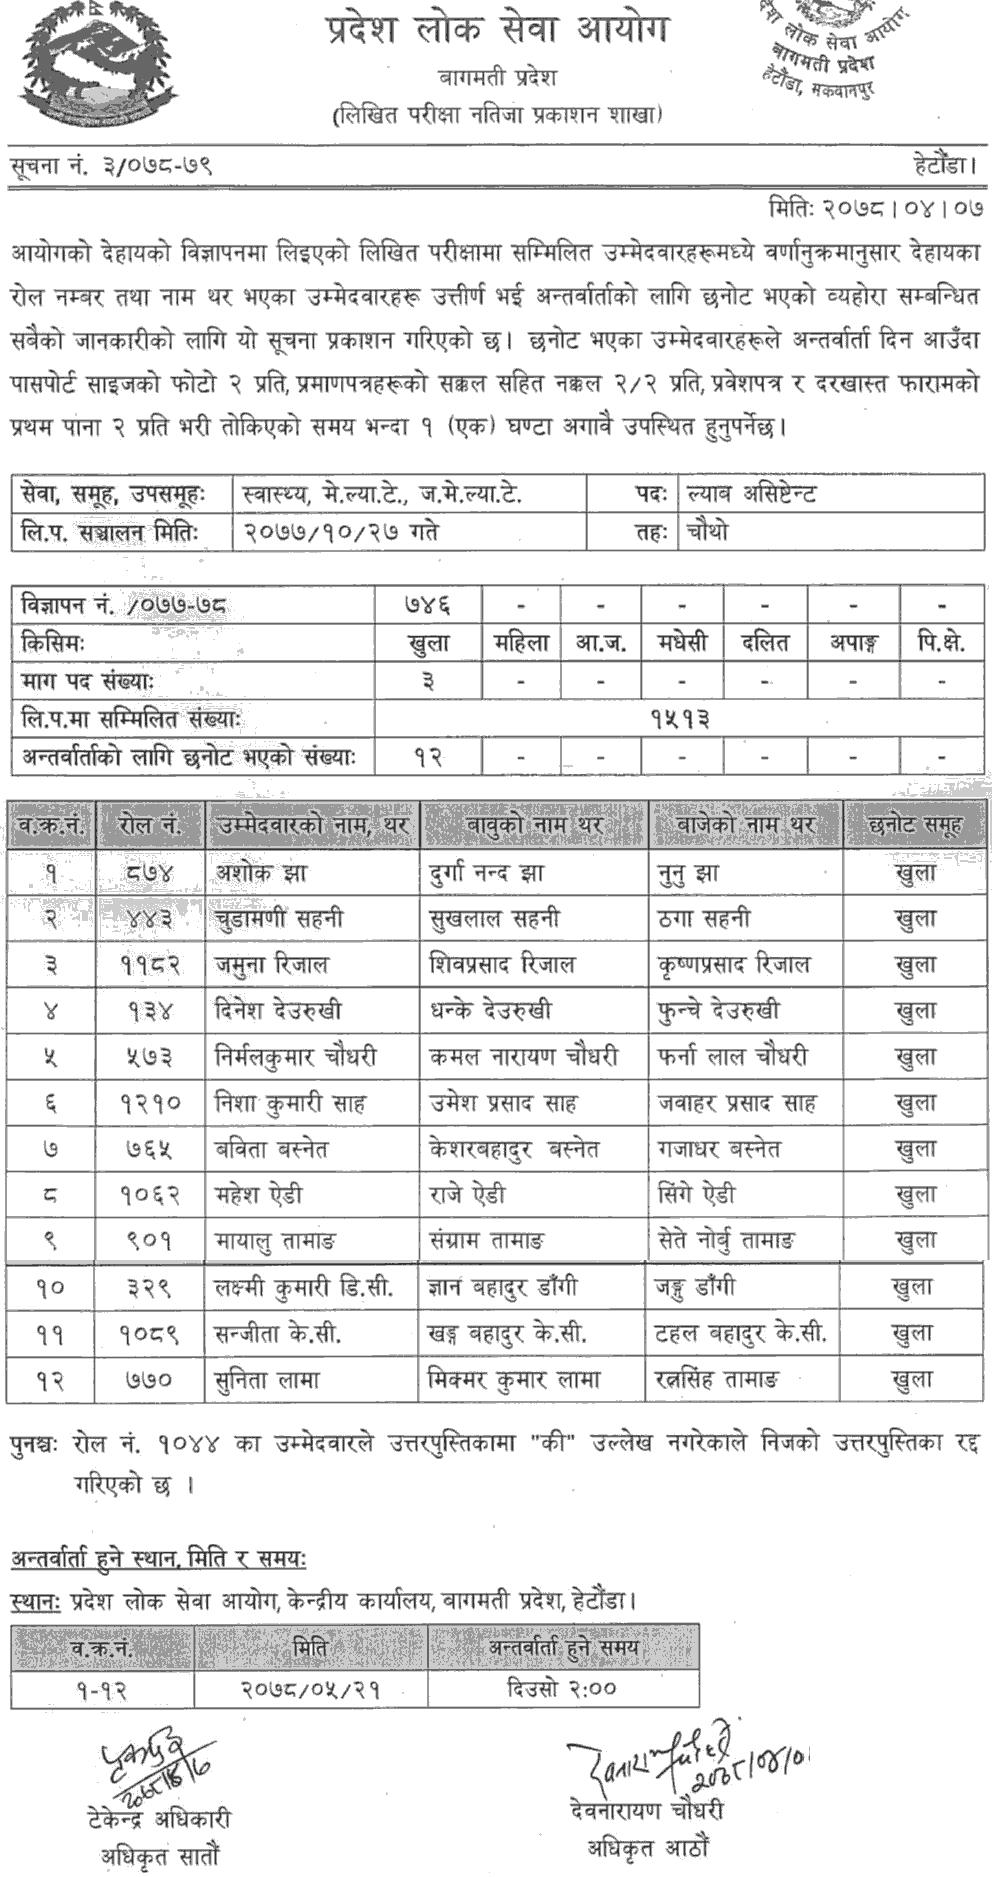 Bagmati Pradesh Lok Sewa Aayog 4th Level Lab Assistant Written Exam Result